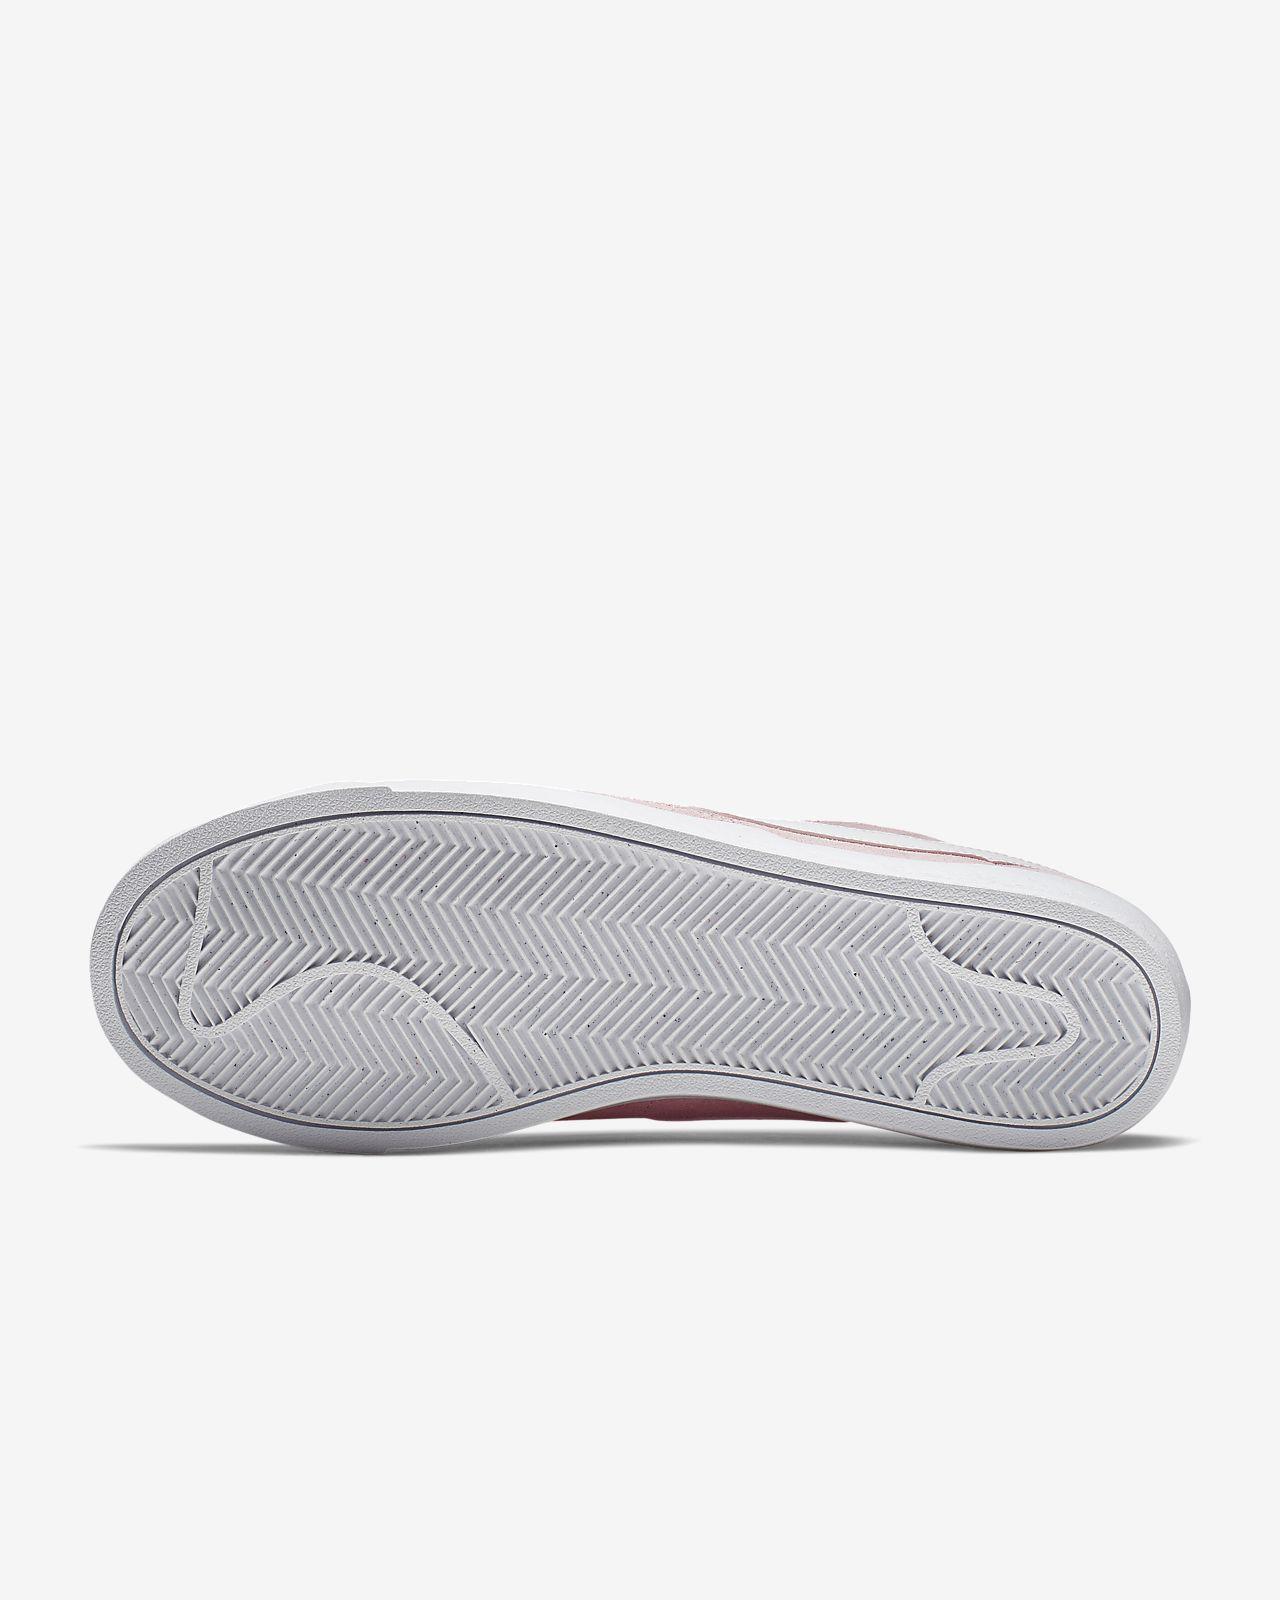 brand new 069a2 44ea7 Low Resolution Nike Blazer Low Suede Women s Shoe Nike Blazer Low Suede Women s  Shoe